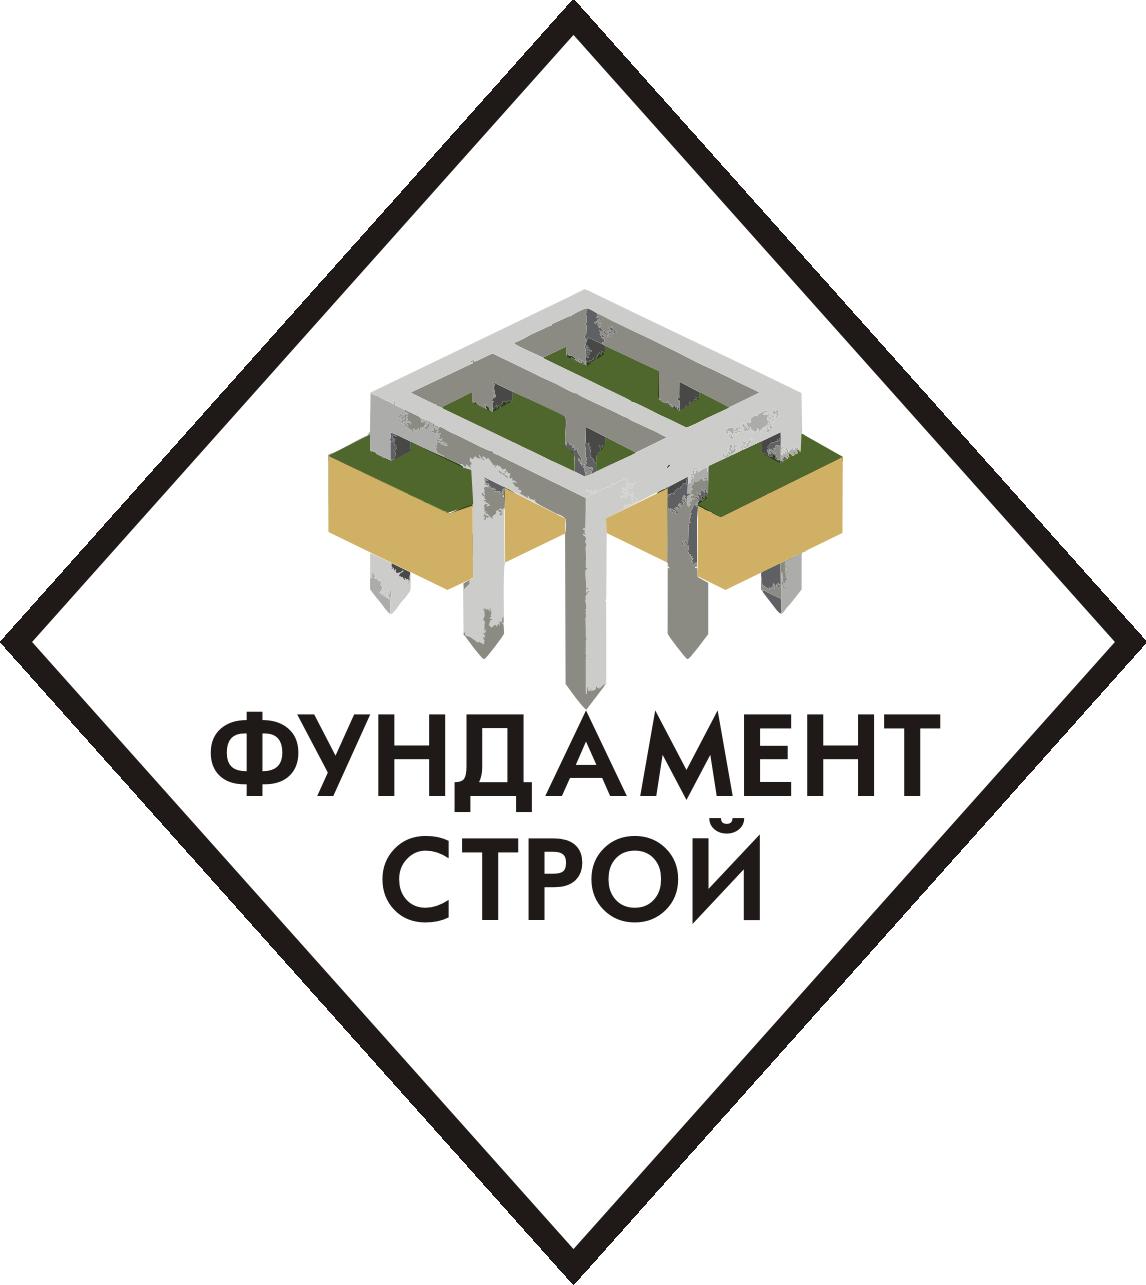 ФУНДАМЕНТ СТРОЙ